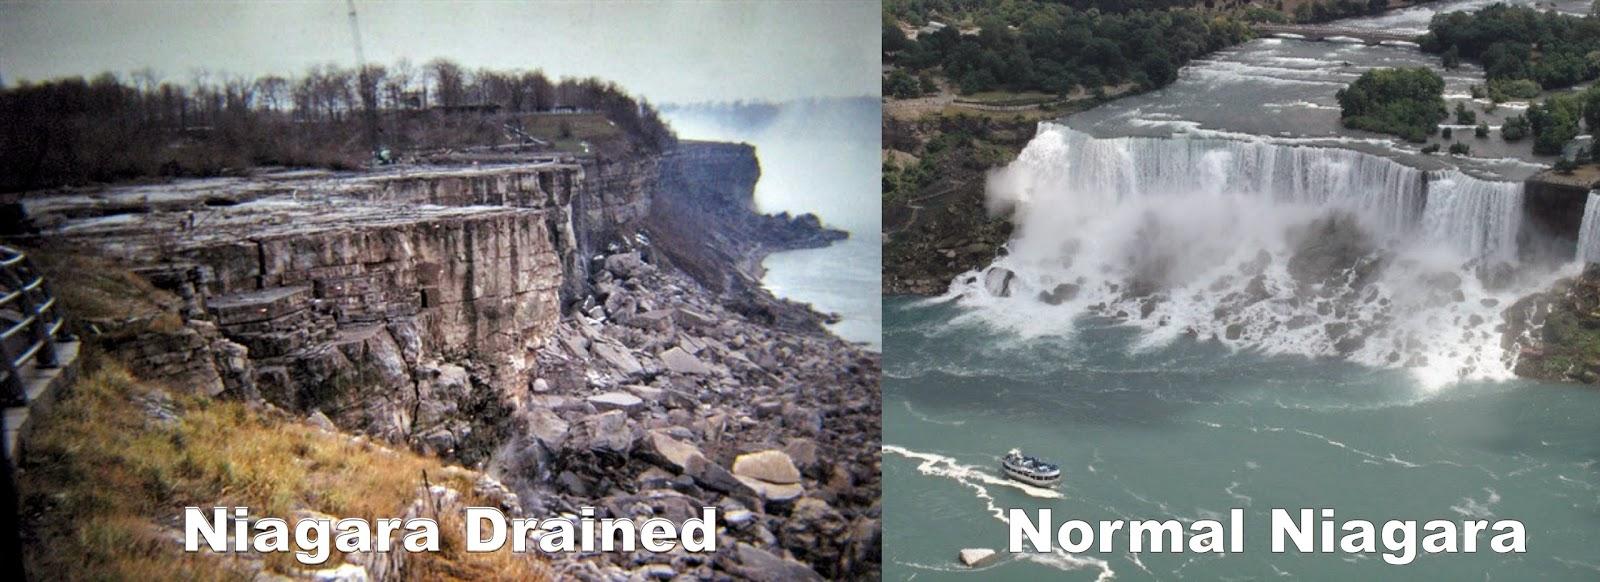 Wfw Niagara Falls Titan Times Online